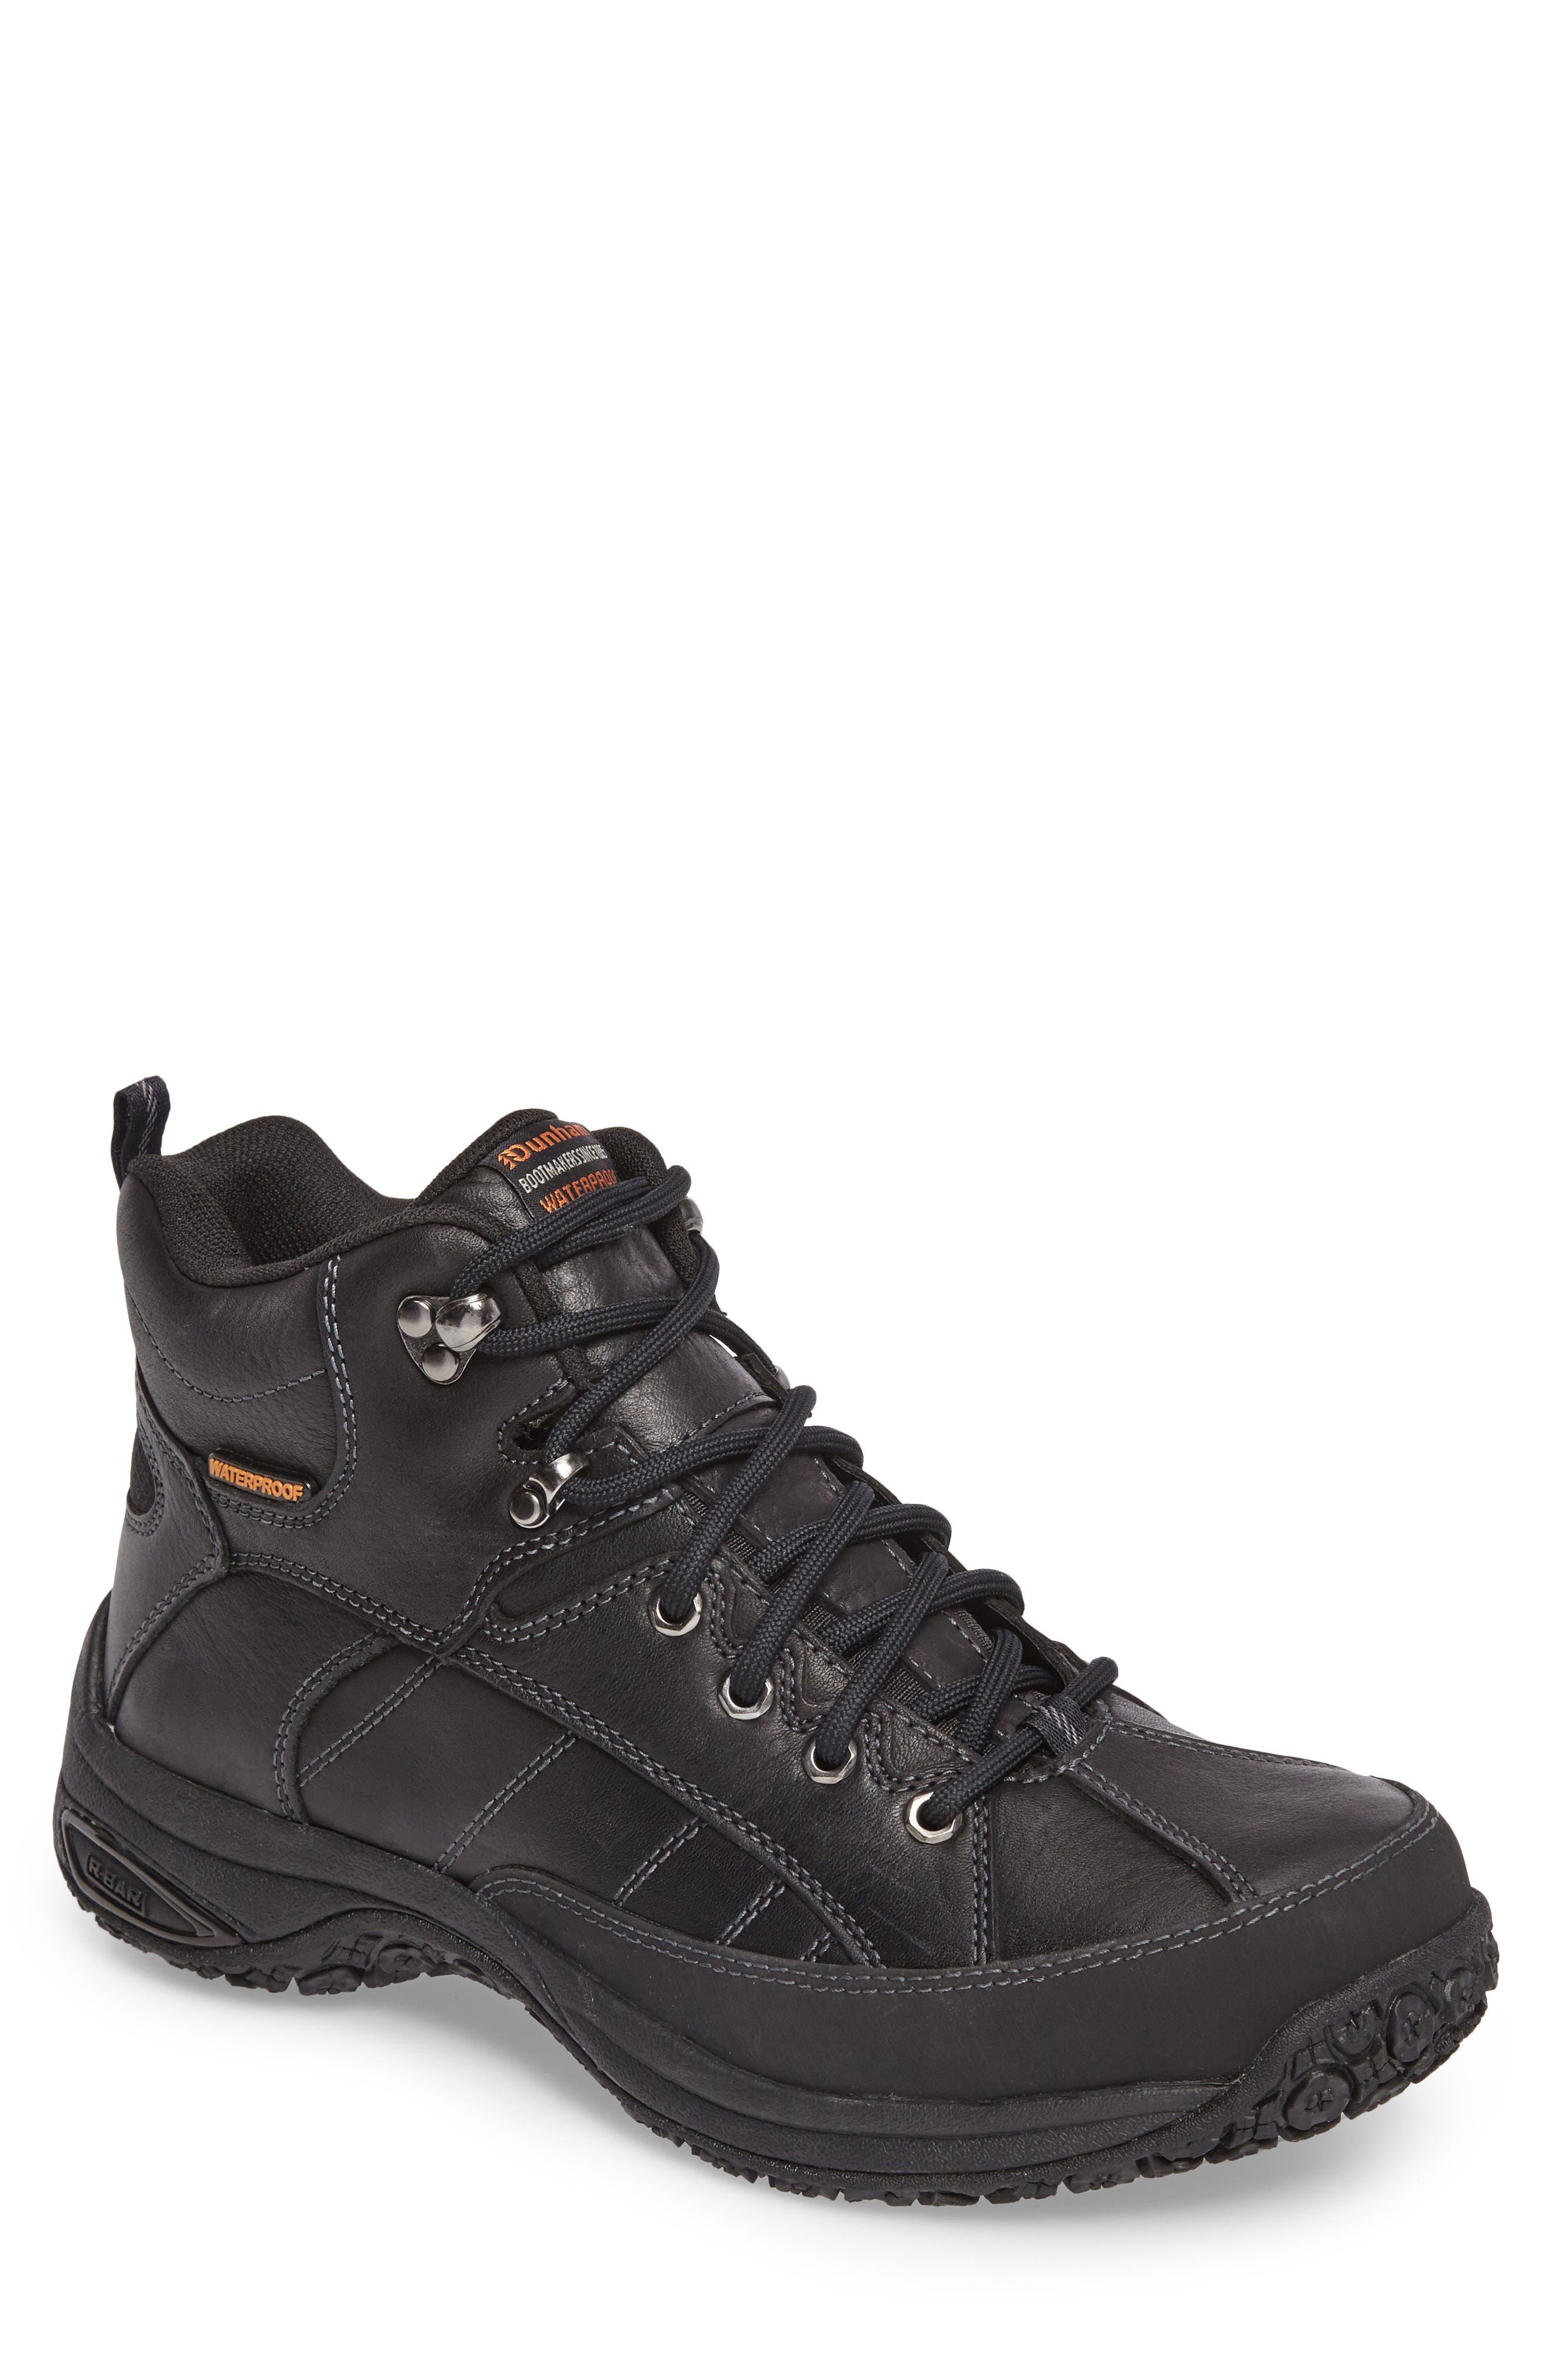 Lawrence Waterproof Boot,                         Main,                         color, BLACK